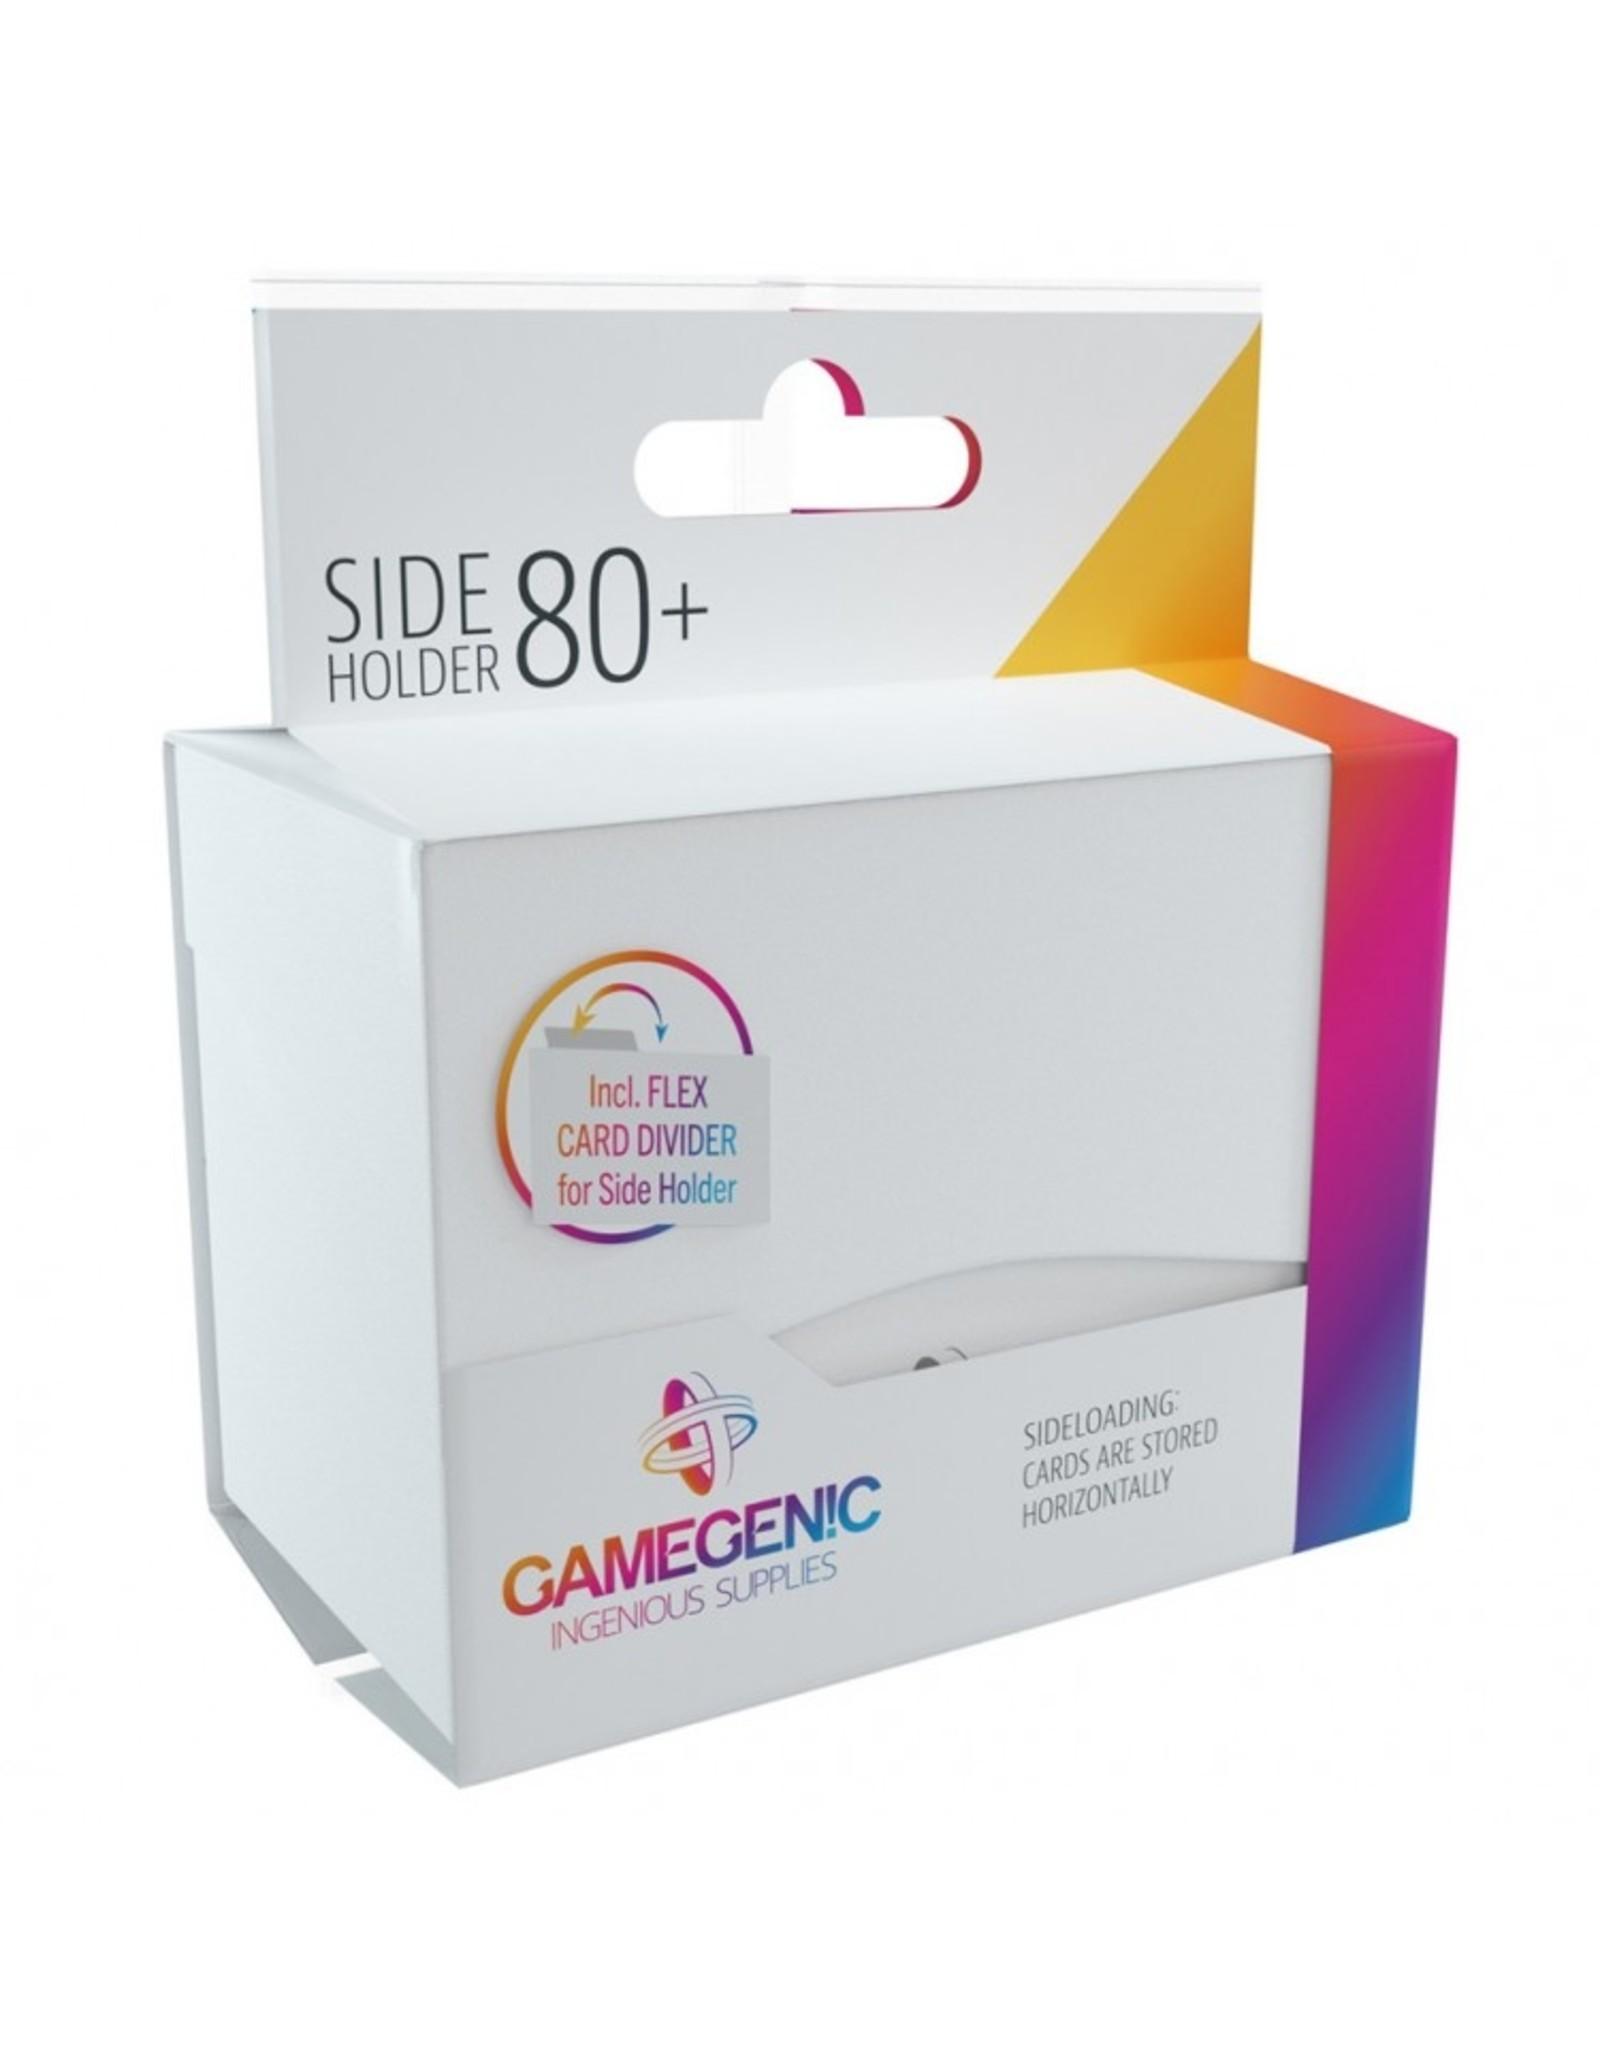 GameGenic Deck Box: Side Holder 80+ WH